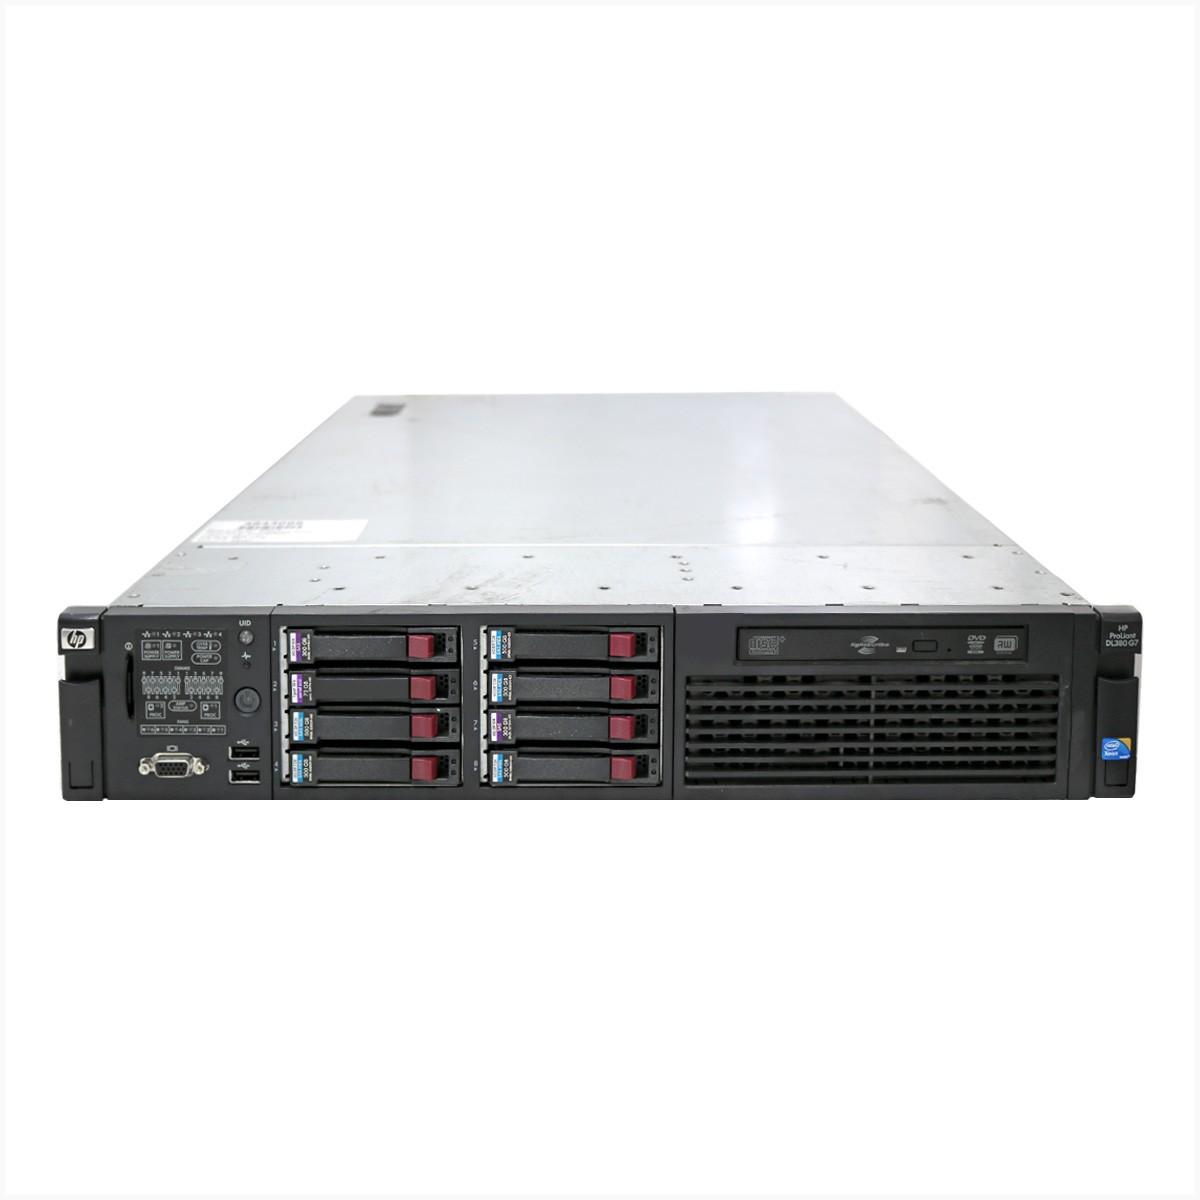 Servidor hp dl380 g7 2x xeon e5649 16gb 1tb - usado